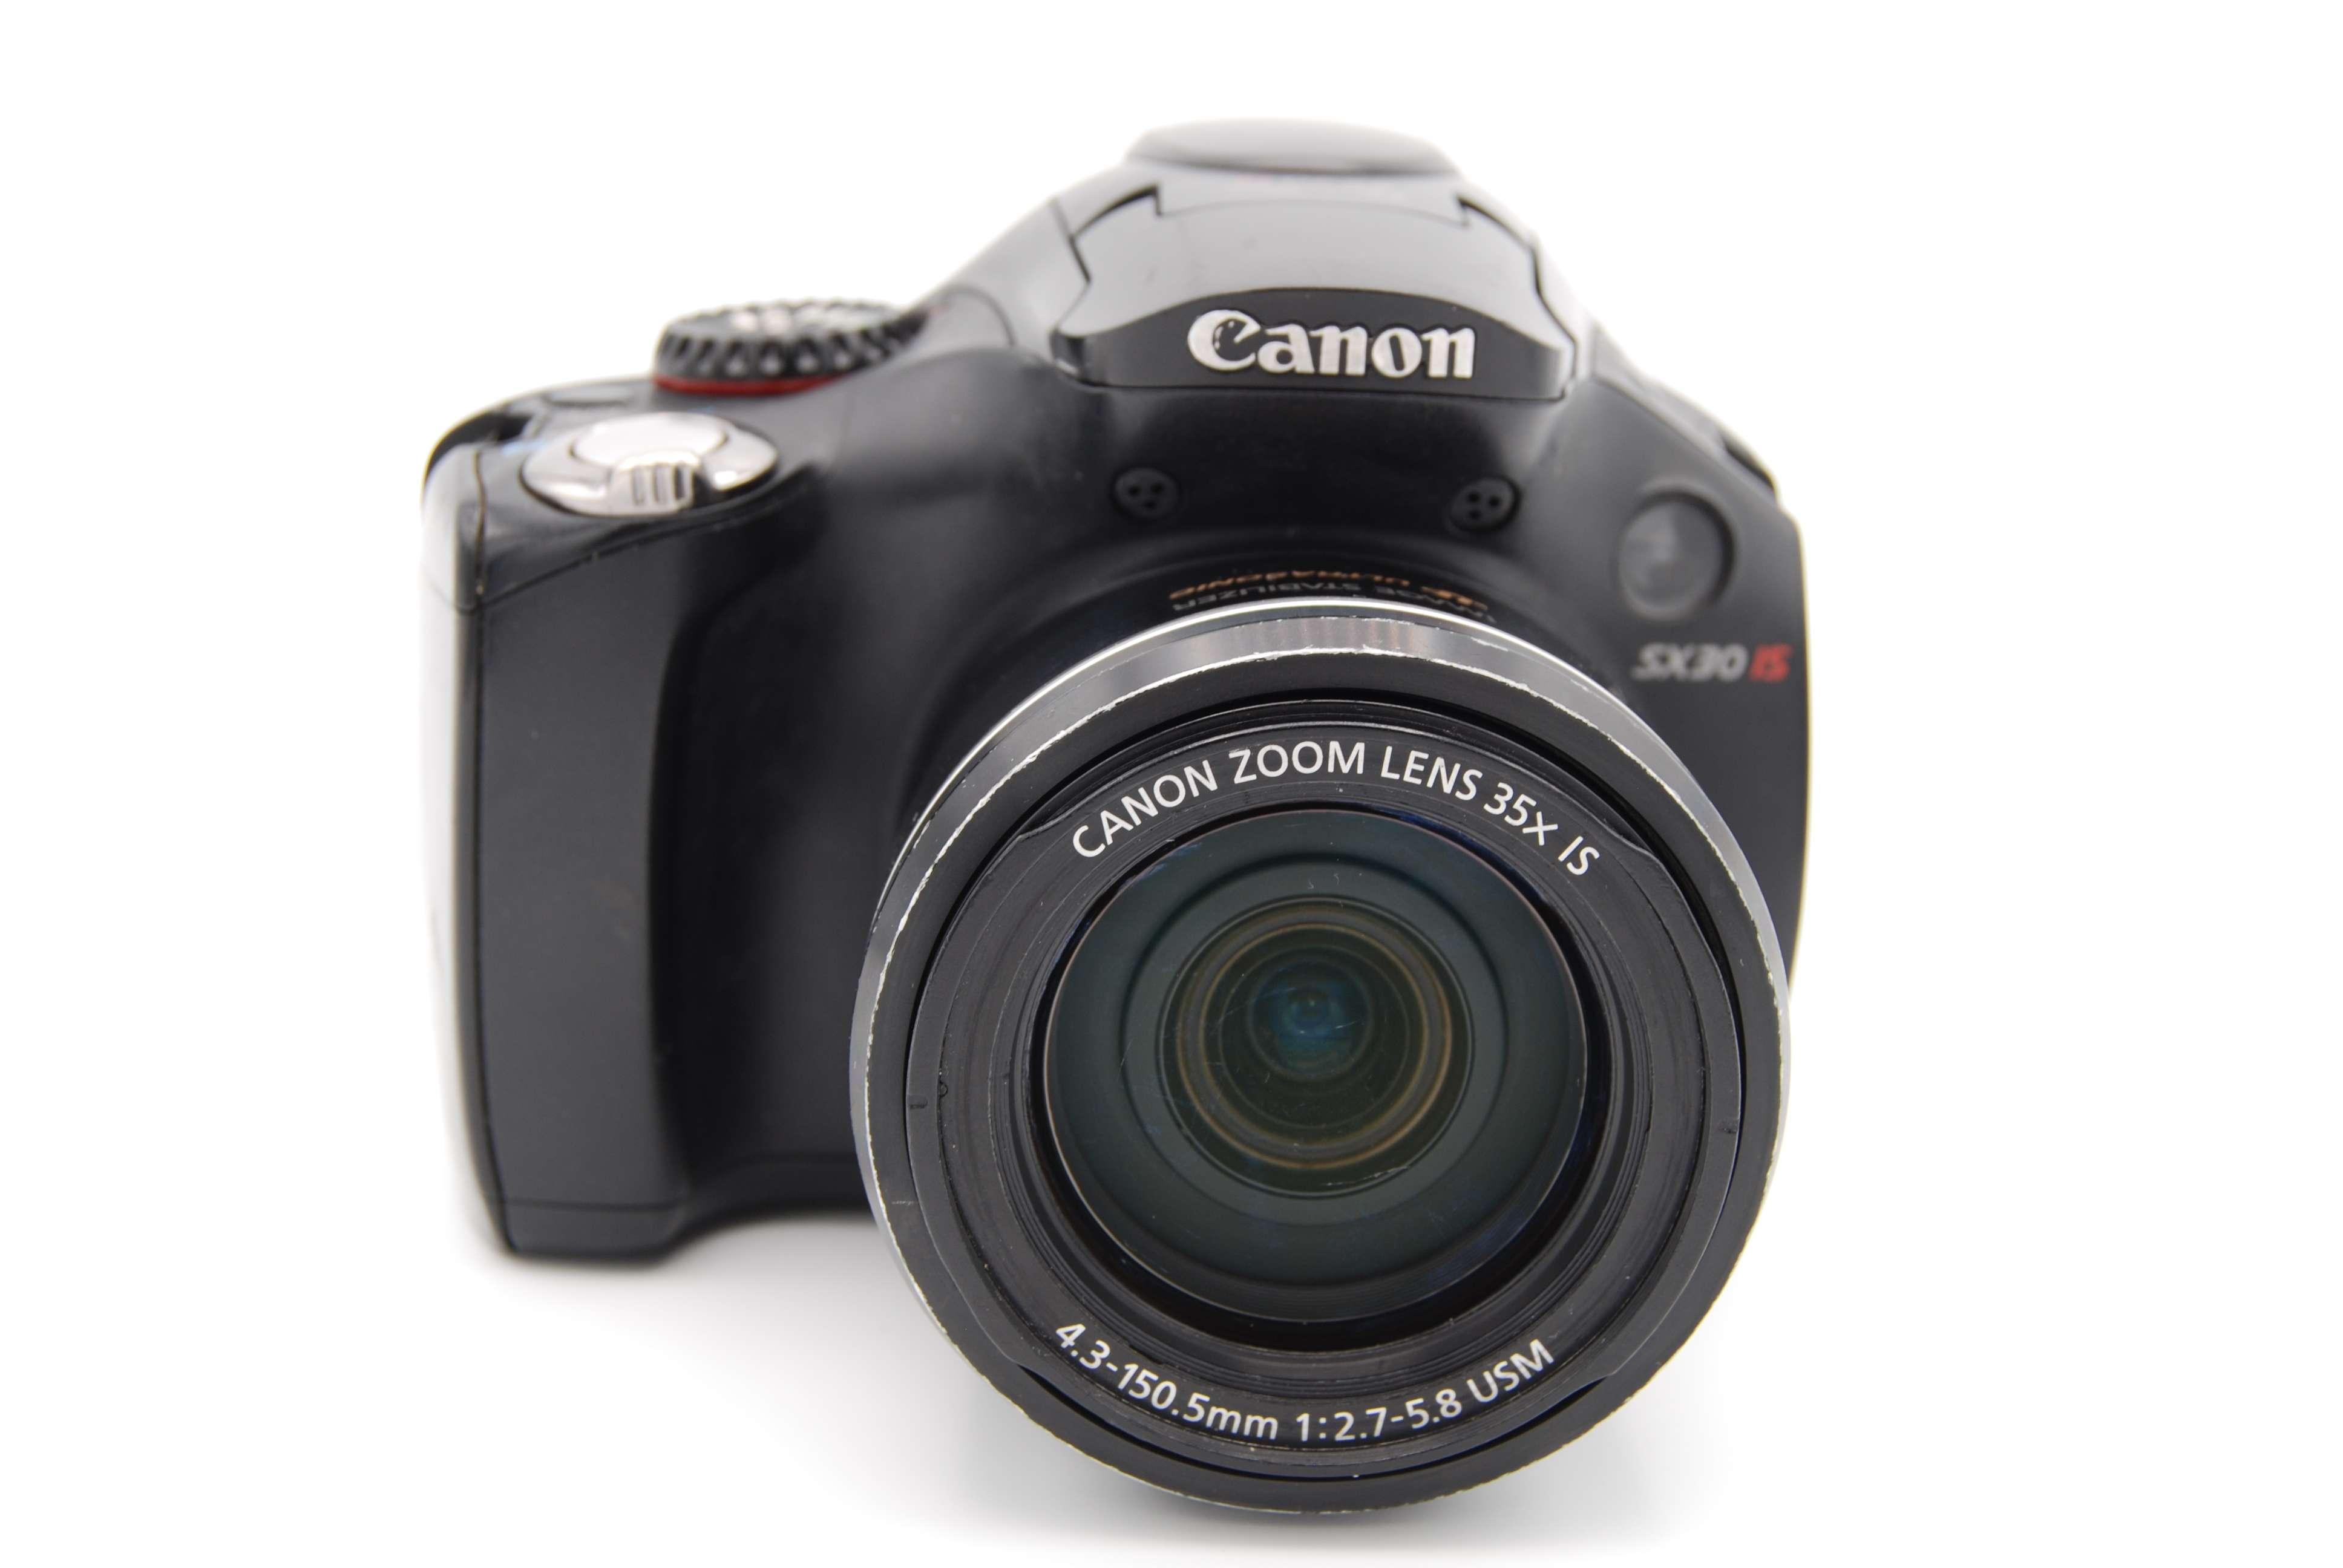 Canon PowerShot SX30 IS 14.1 MP 2.7'' SCREEN 35X ZOOM Digital Camera - Black